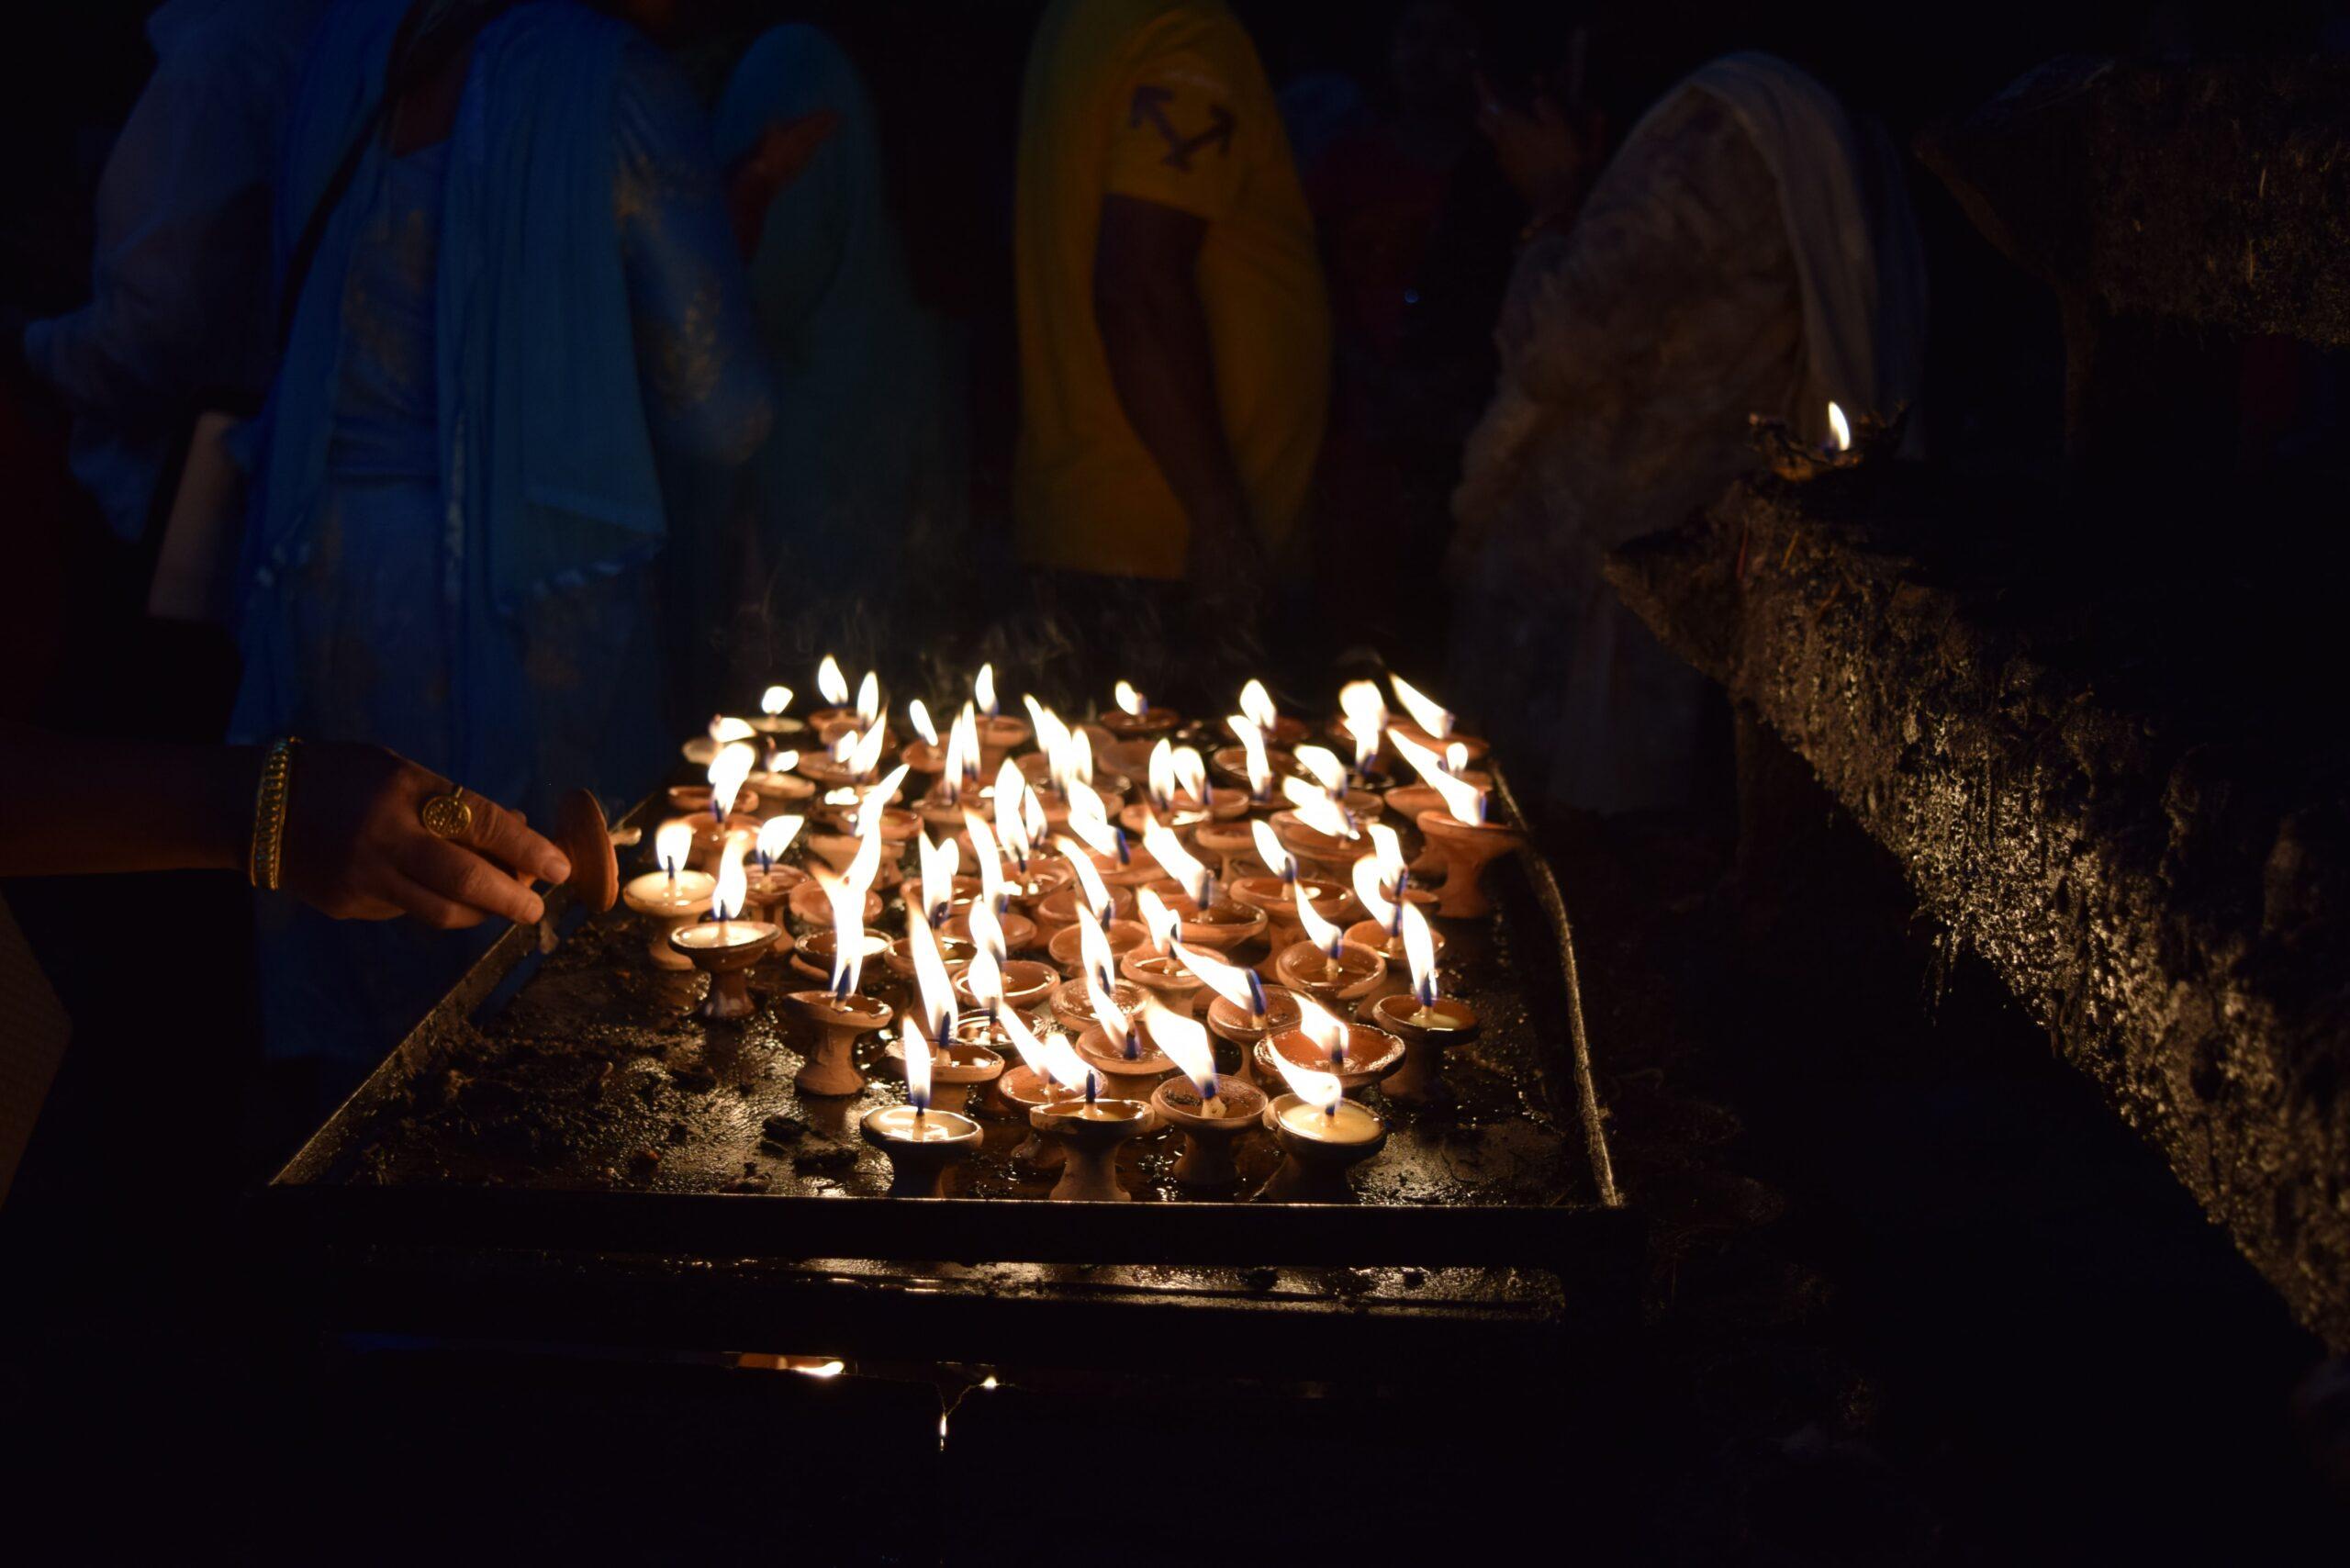 sumina-d-Votive candle lights at Hindu Temple-unsplash